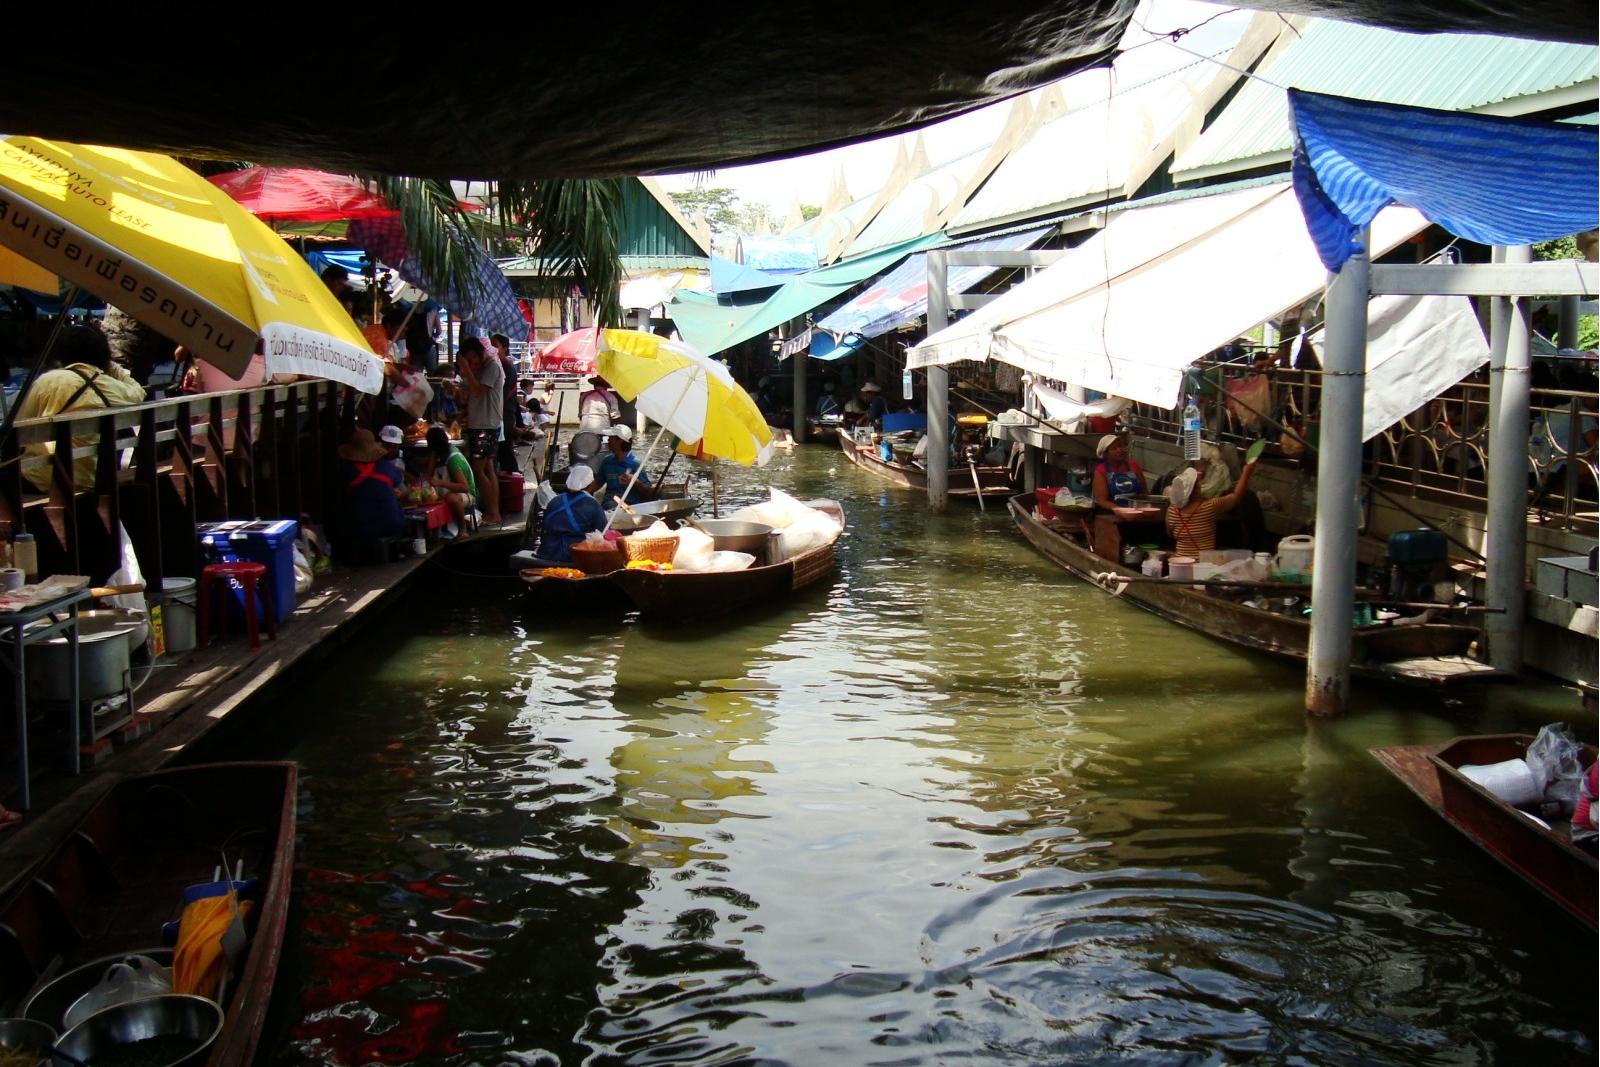 Taling Chan Floating Market, upstream on the Chao Phraya